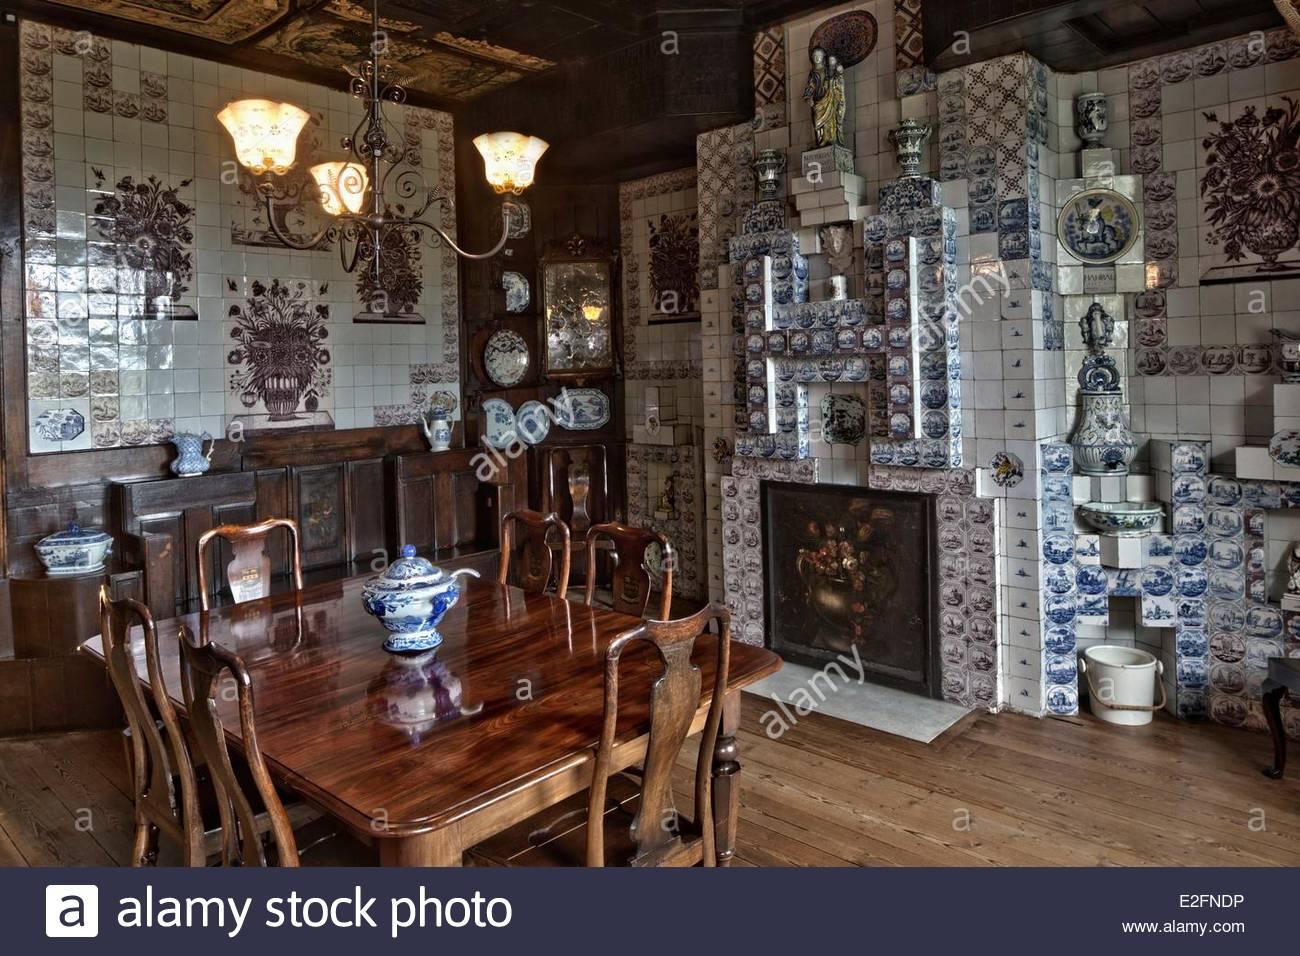 White Room Guernsey